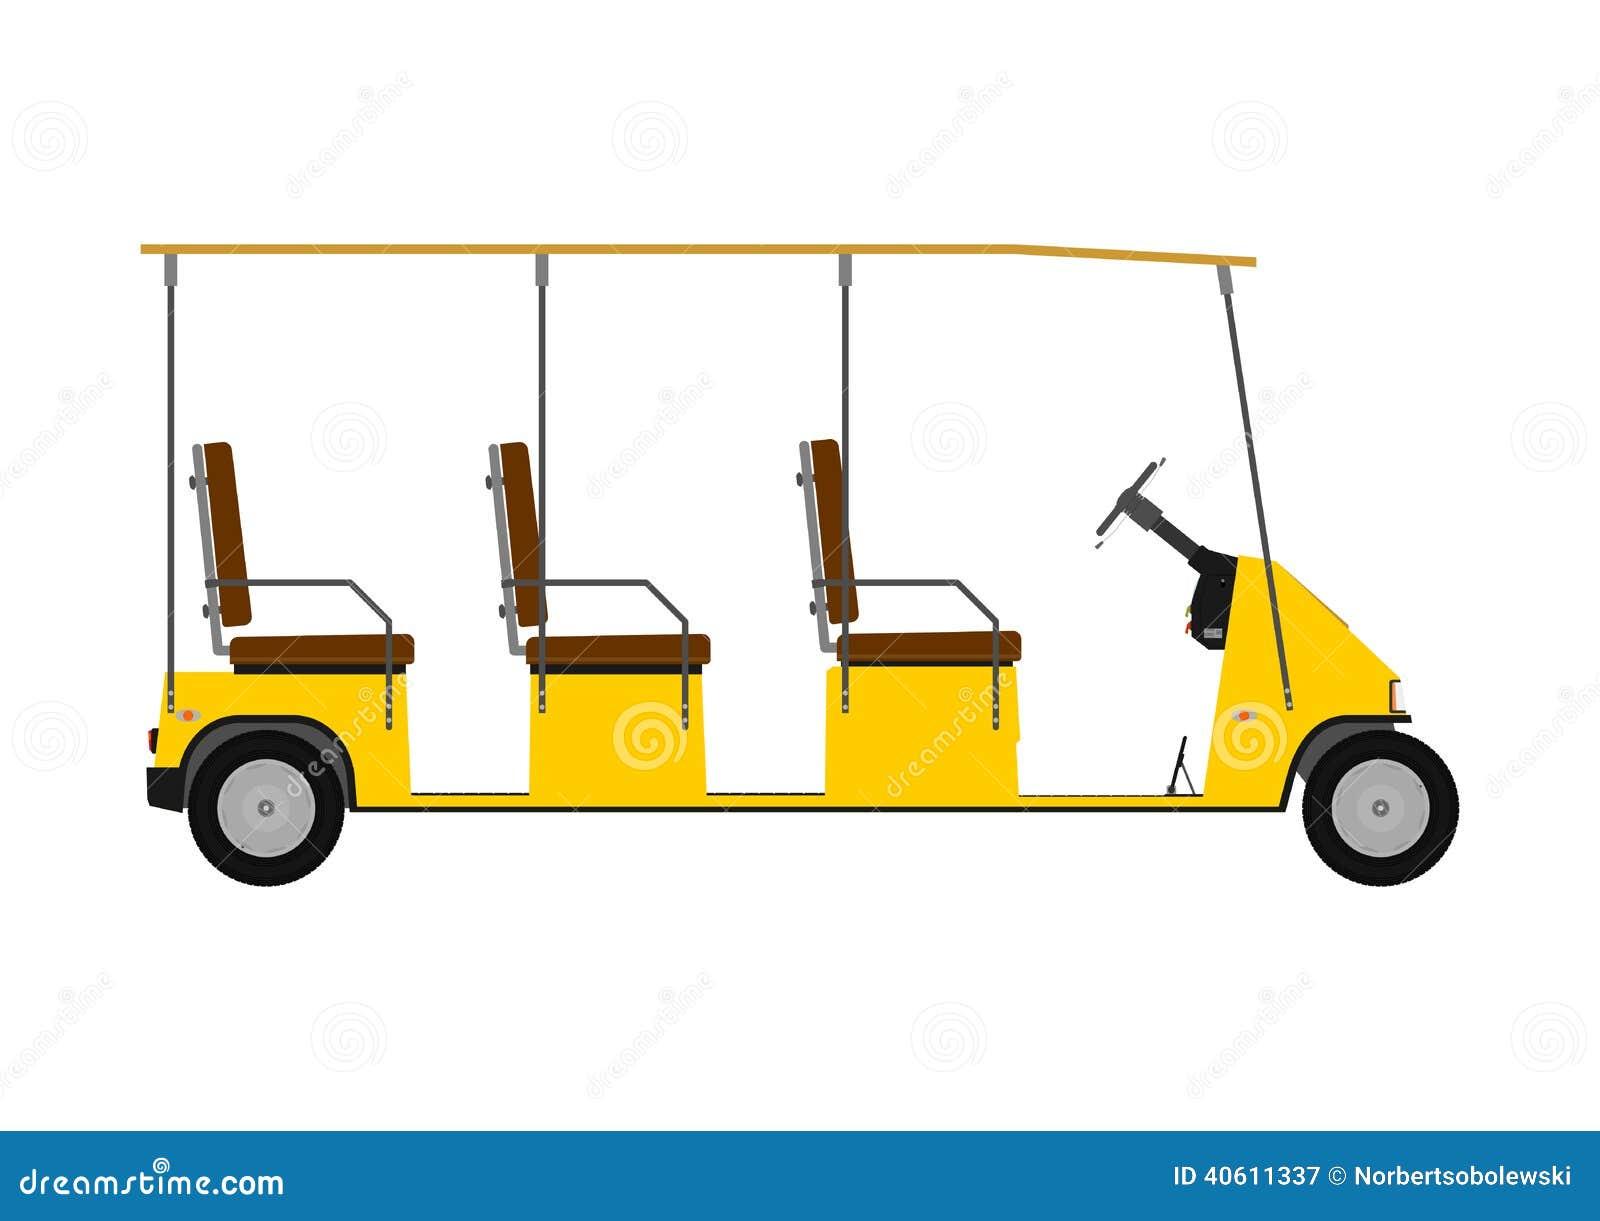 Silhouette Of Golf Cart Stock Vector Illustration Of Motor 40611337